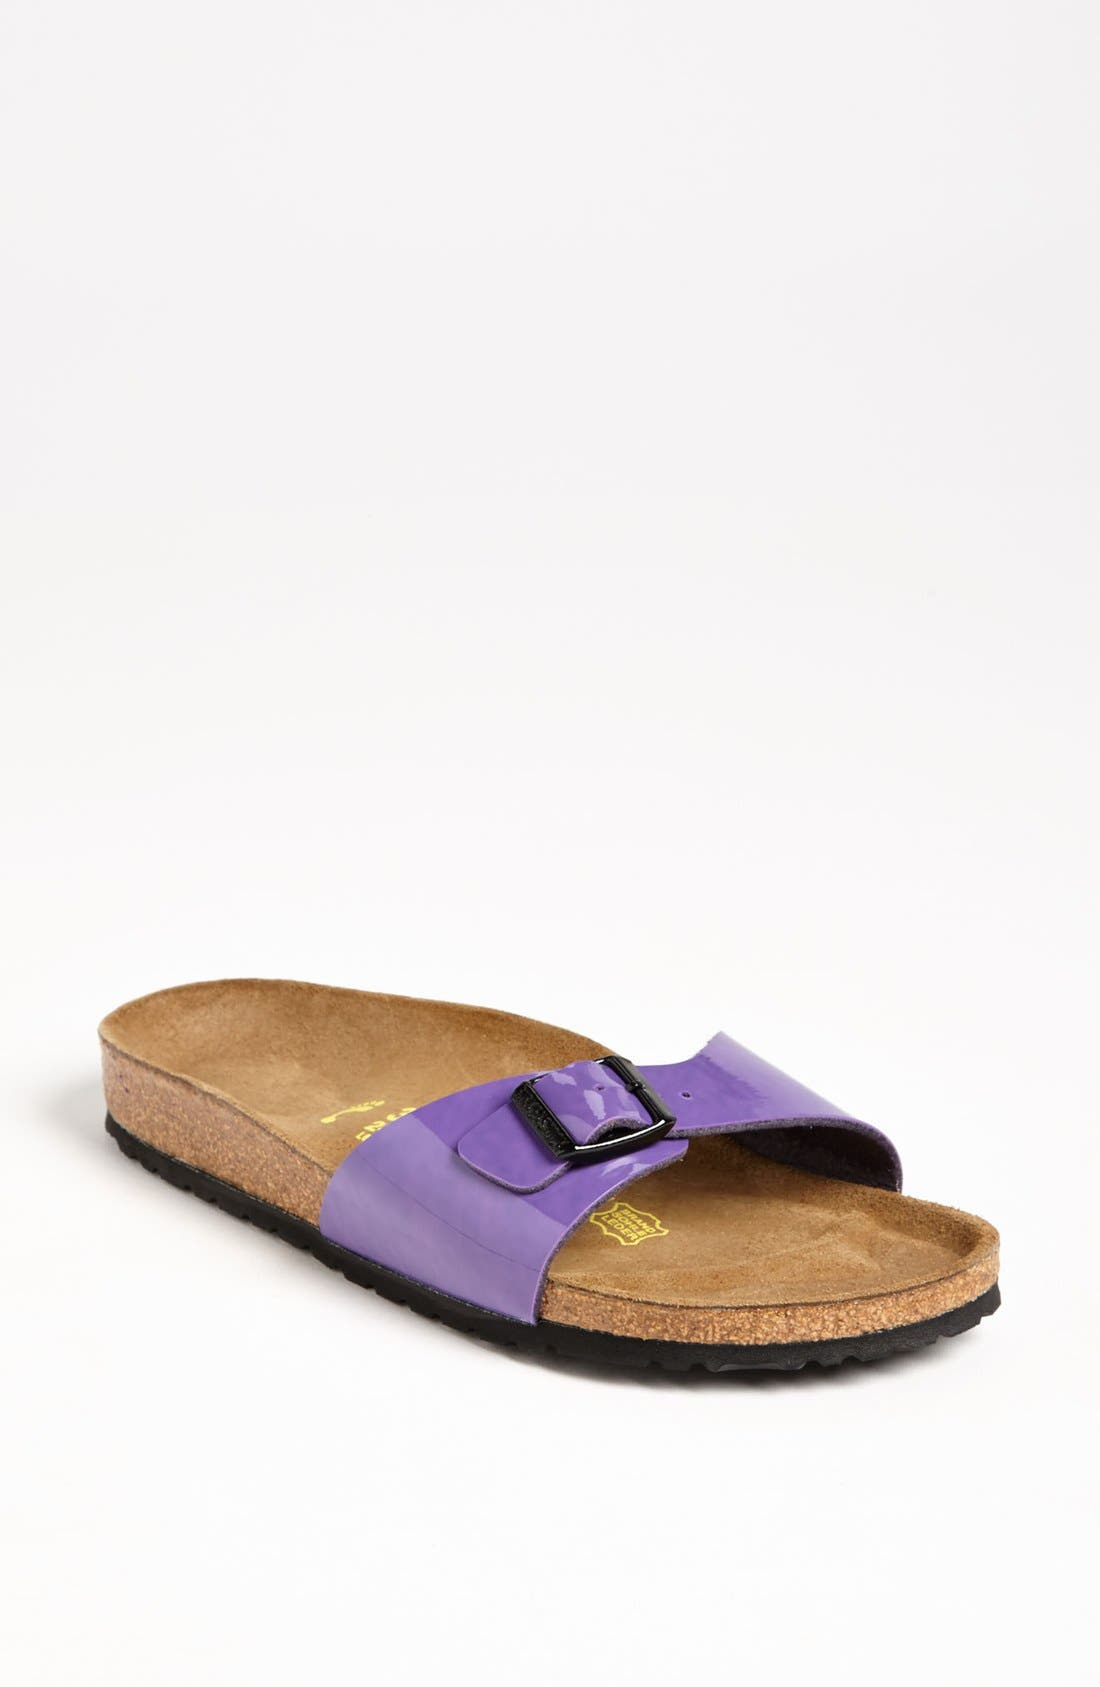 Alternate Image 1 Selected - Birkenstock 'Madrid' Birko-Flor™ Sandal (Women)